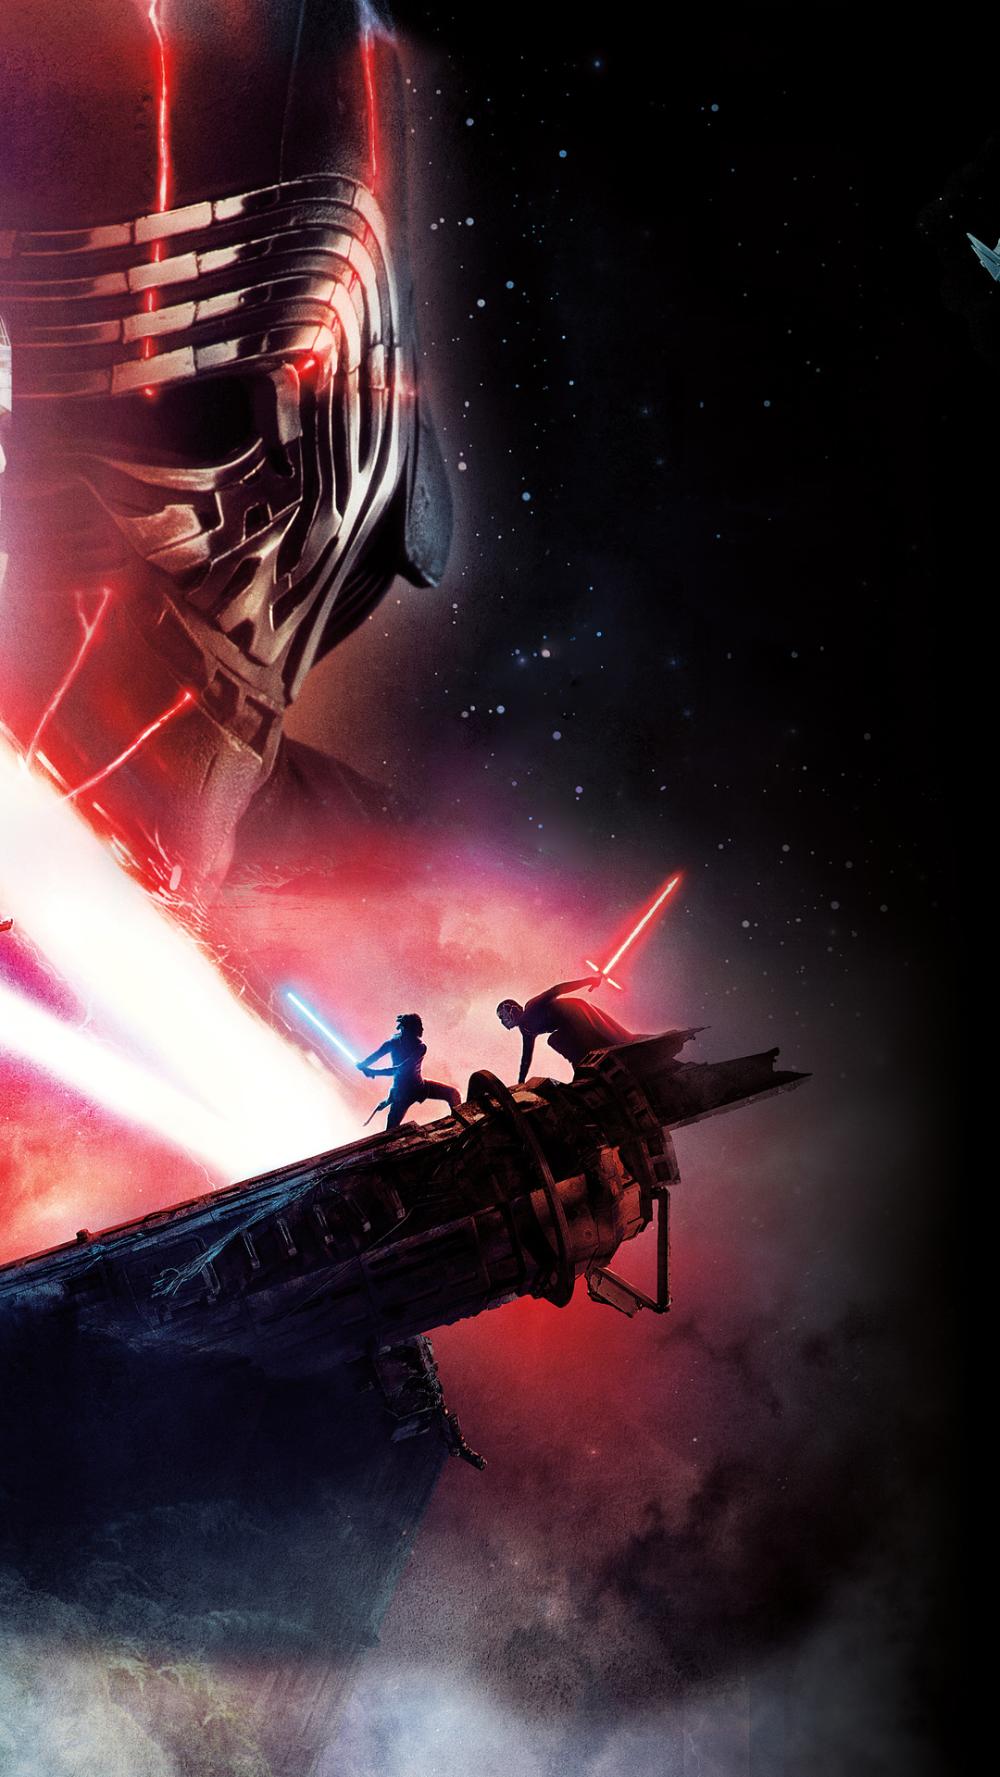 Star Wars The Rise Of Skywalker 12k In 1080x1920 Resolution Star Wars Background Star Wars Wallpaper Iphone Star Wars Pictures